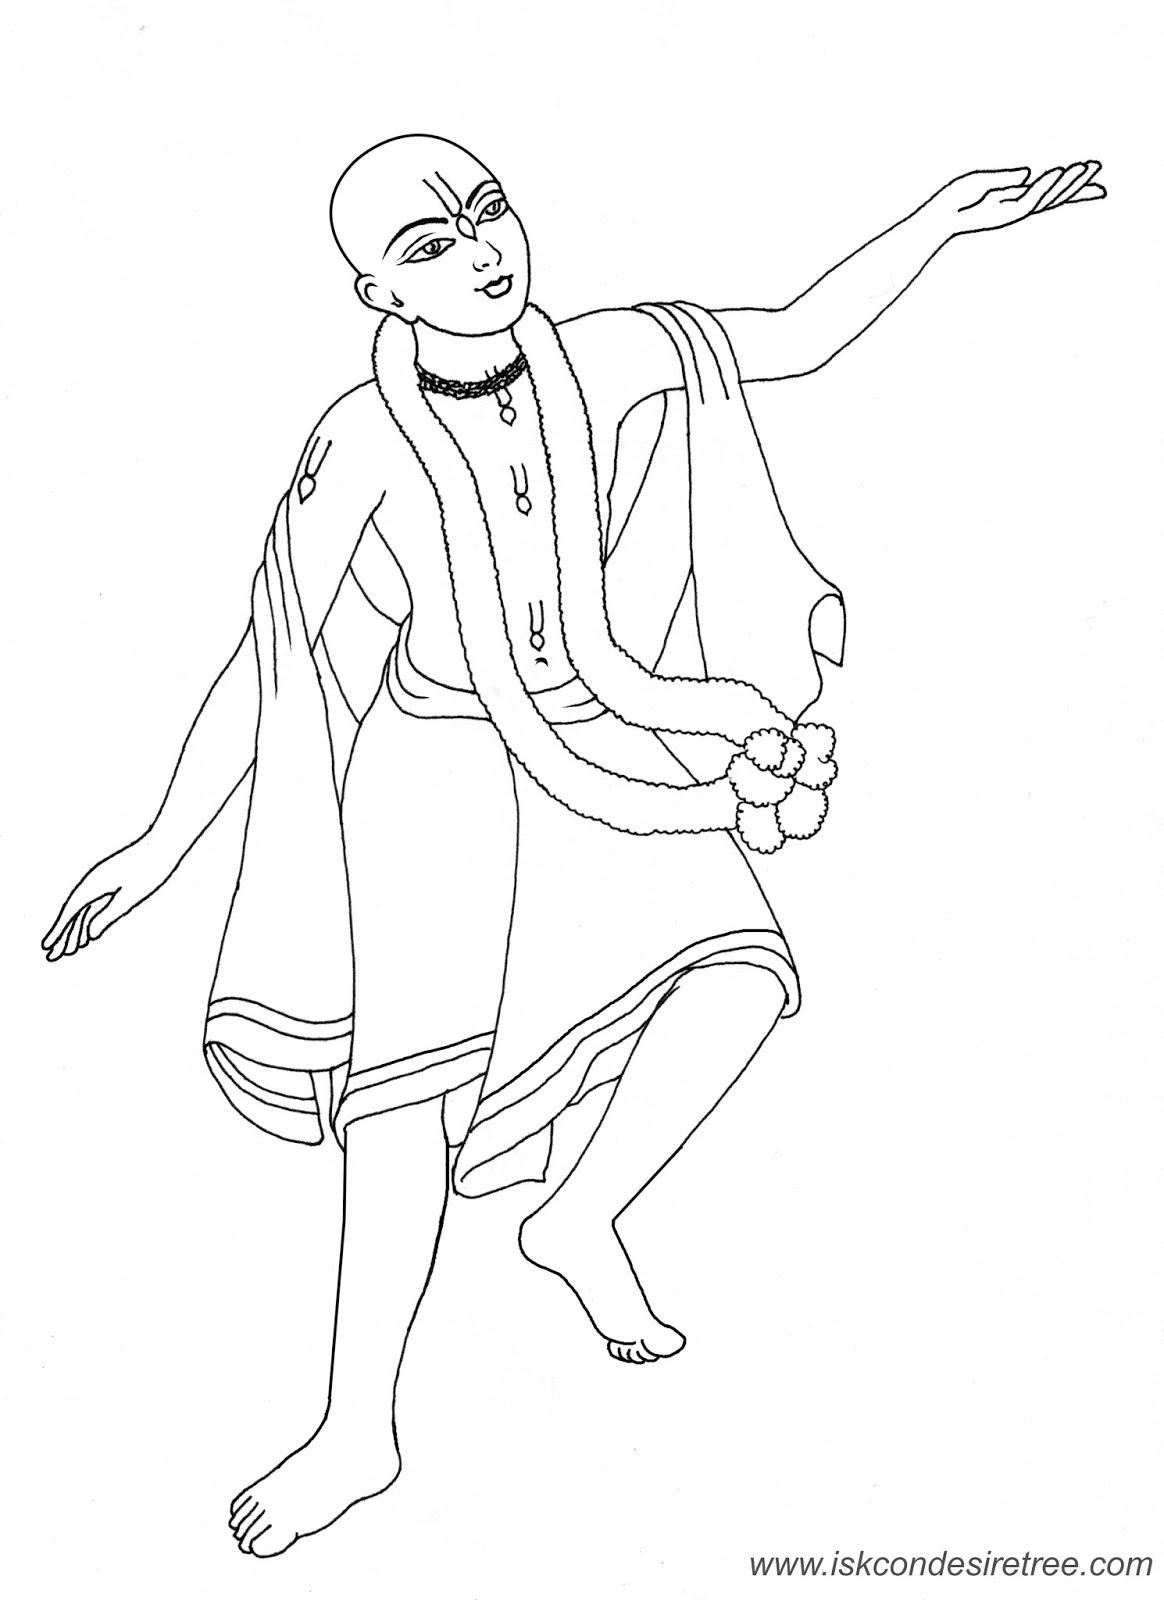 1164x1600 Bhagavat Chintan Das (Bhikaji) Sri Chaitanya Mahaprabhu Line Drawing